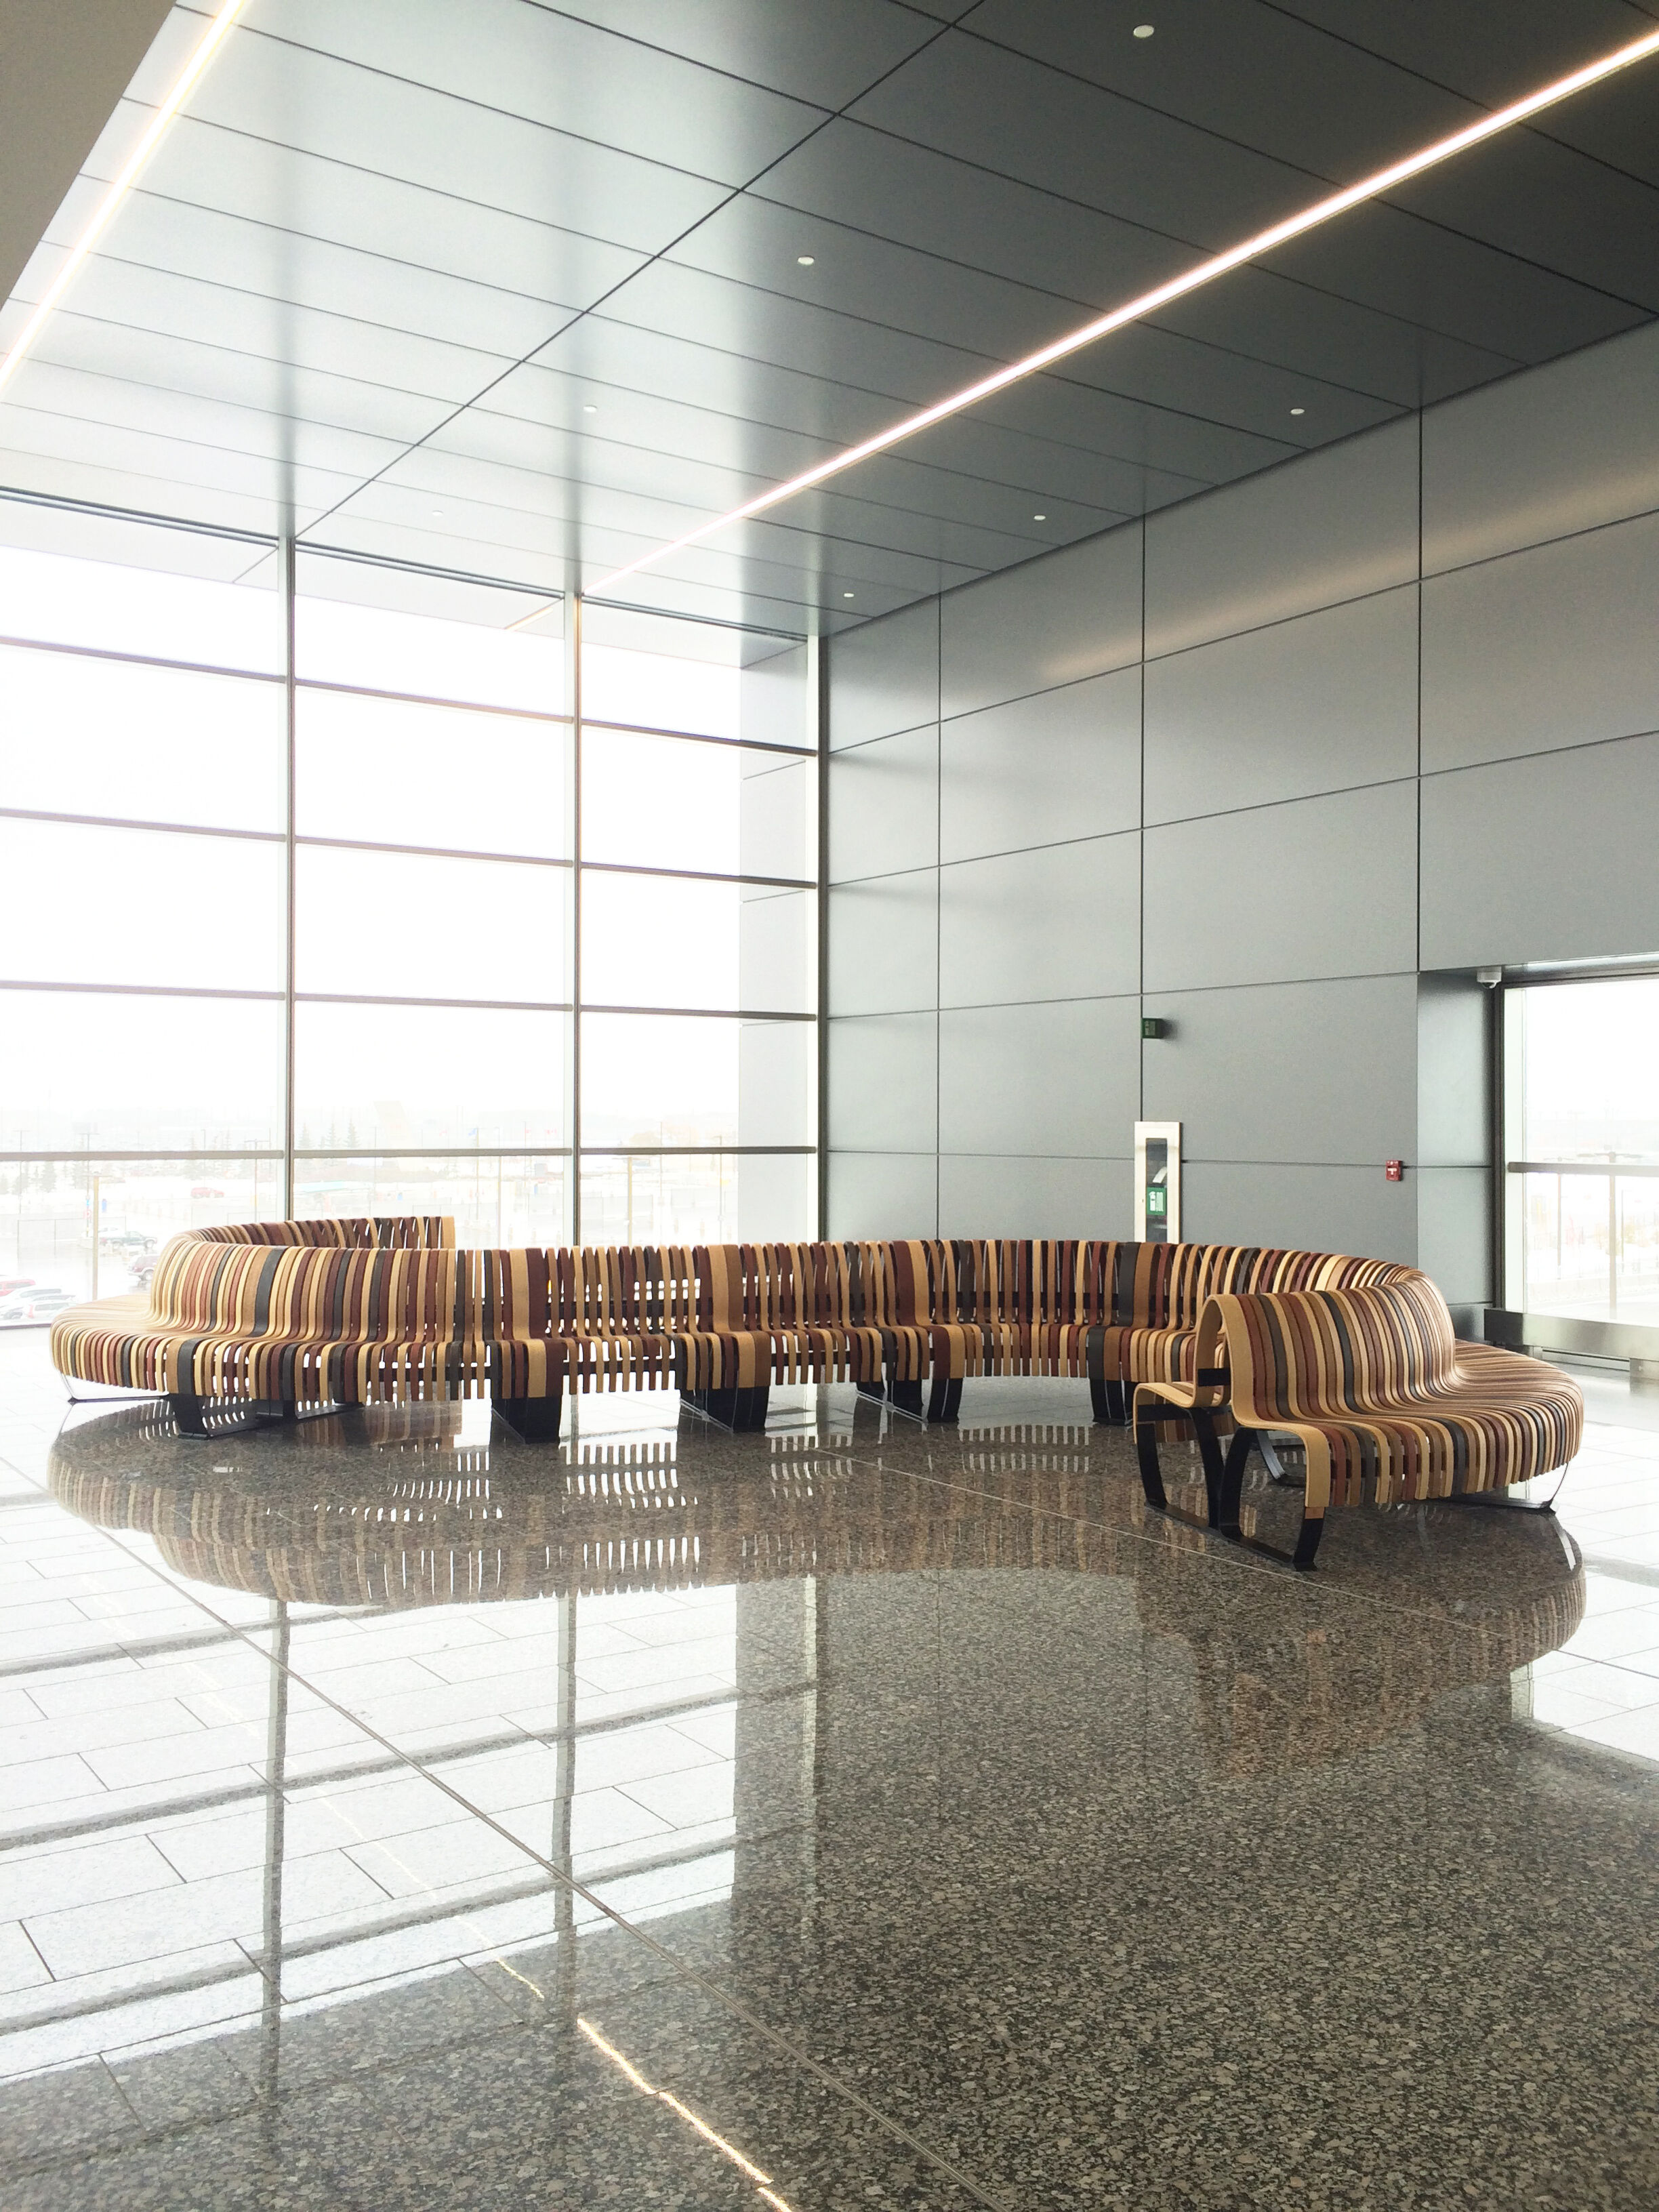 Nova C Seating at Calgary Airport